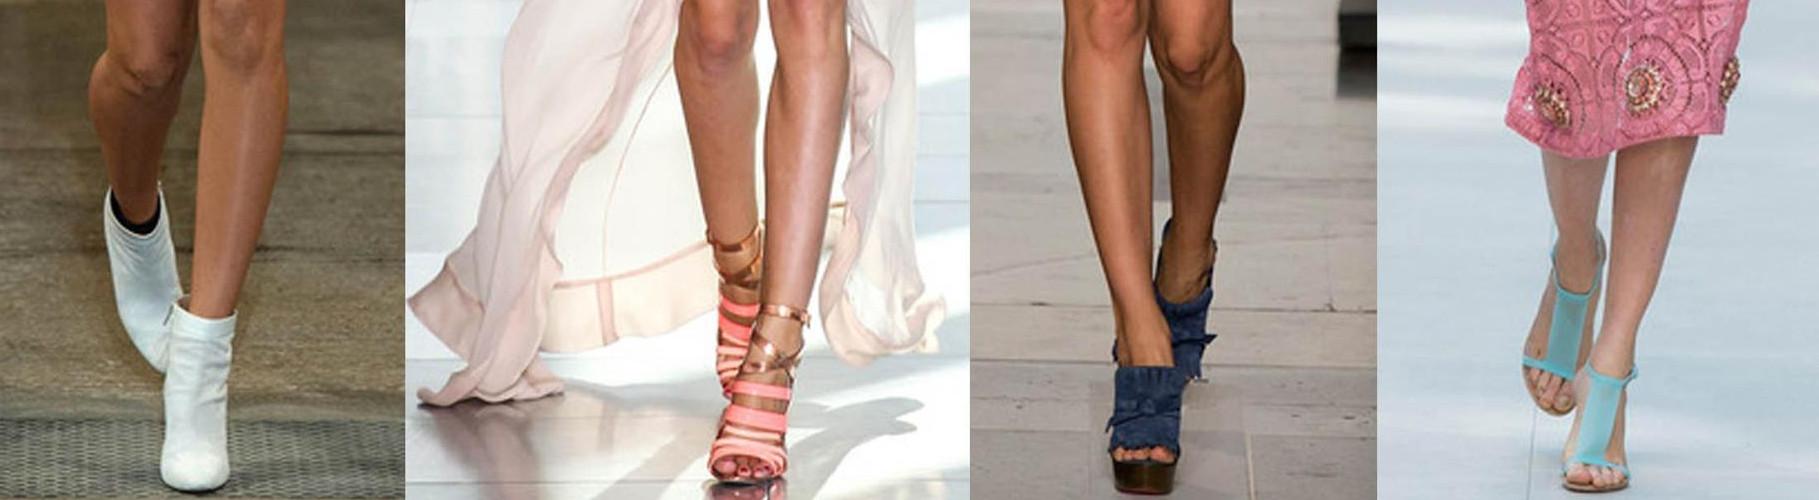 zapatos-de-mujer-banner-1819x500-1